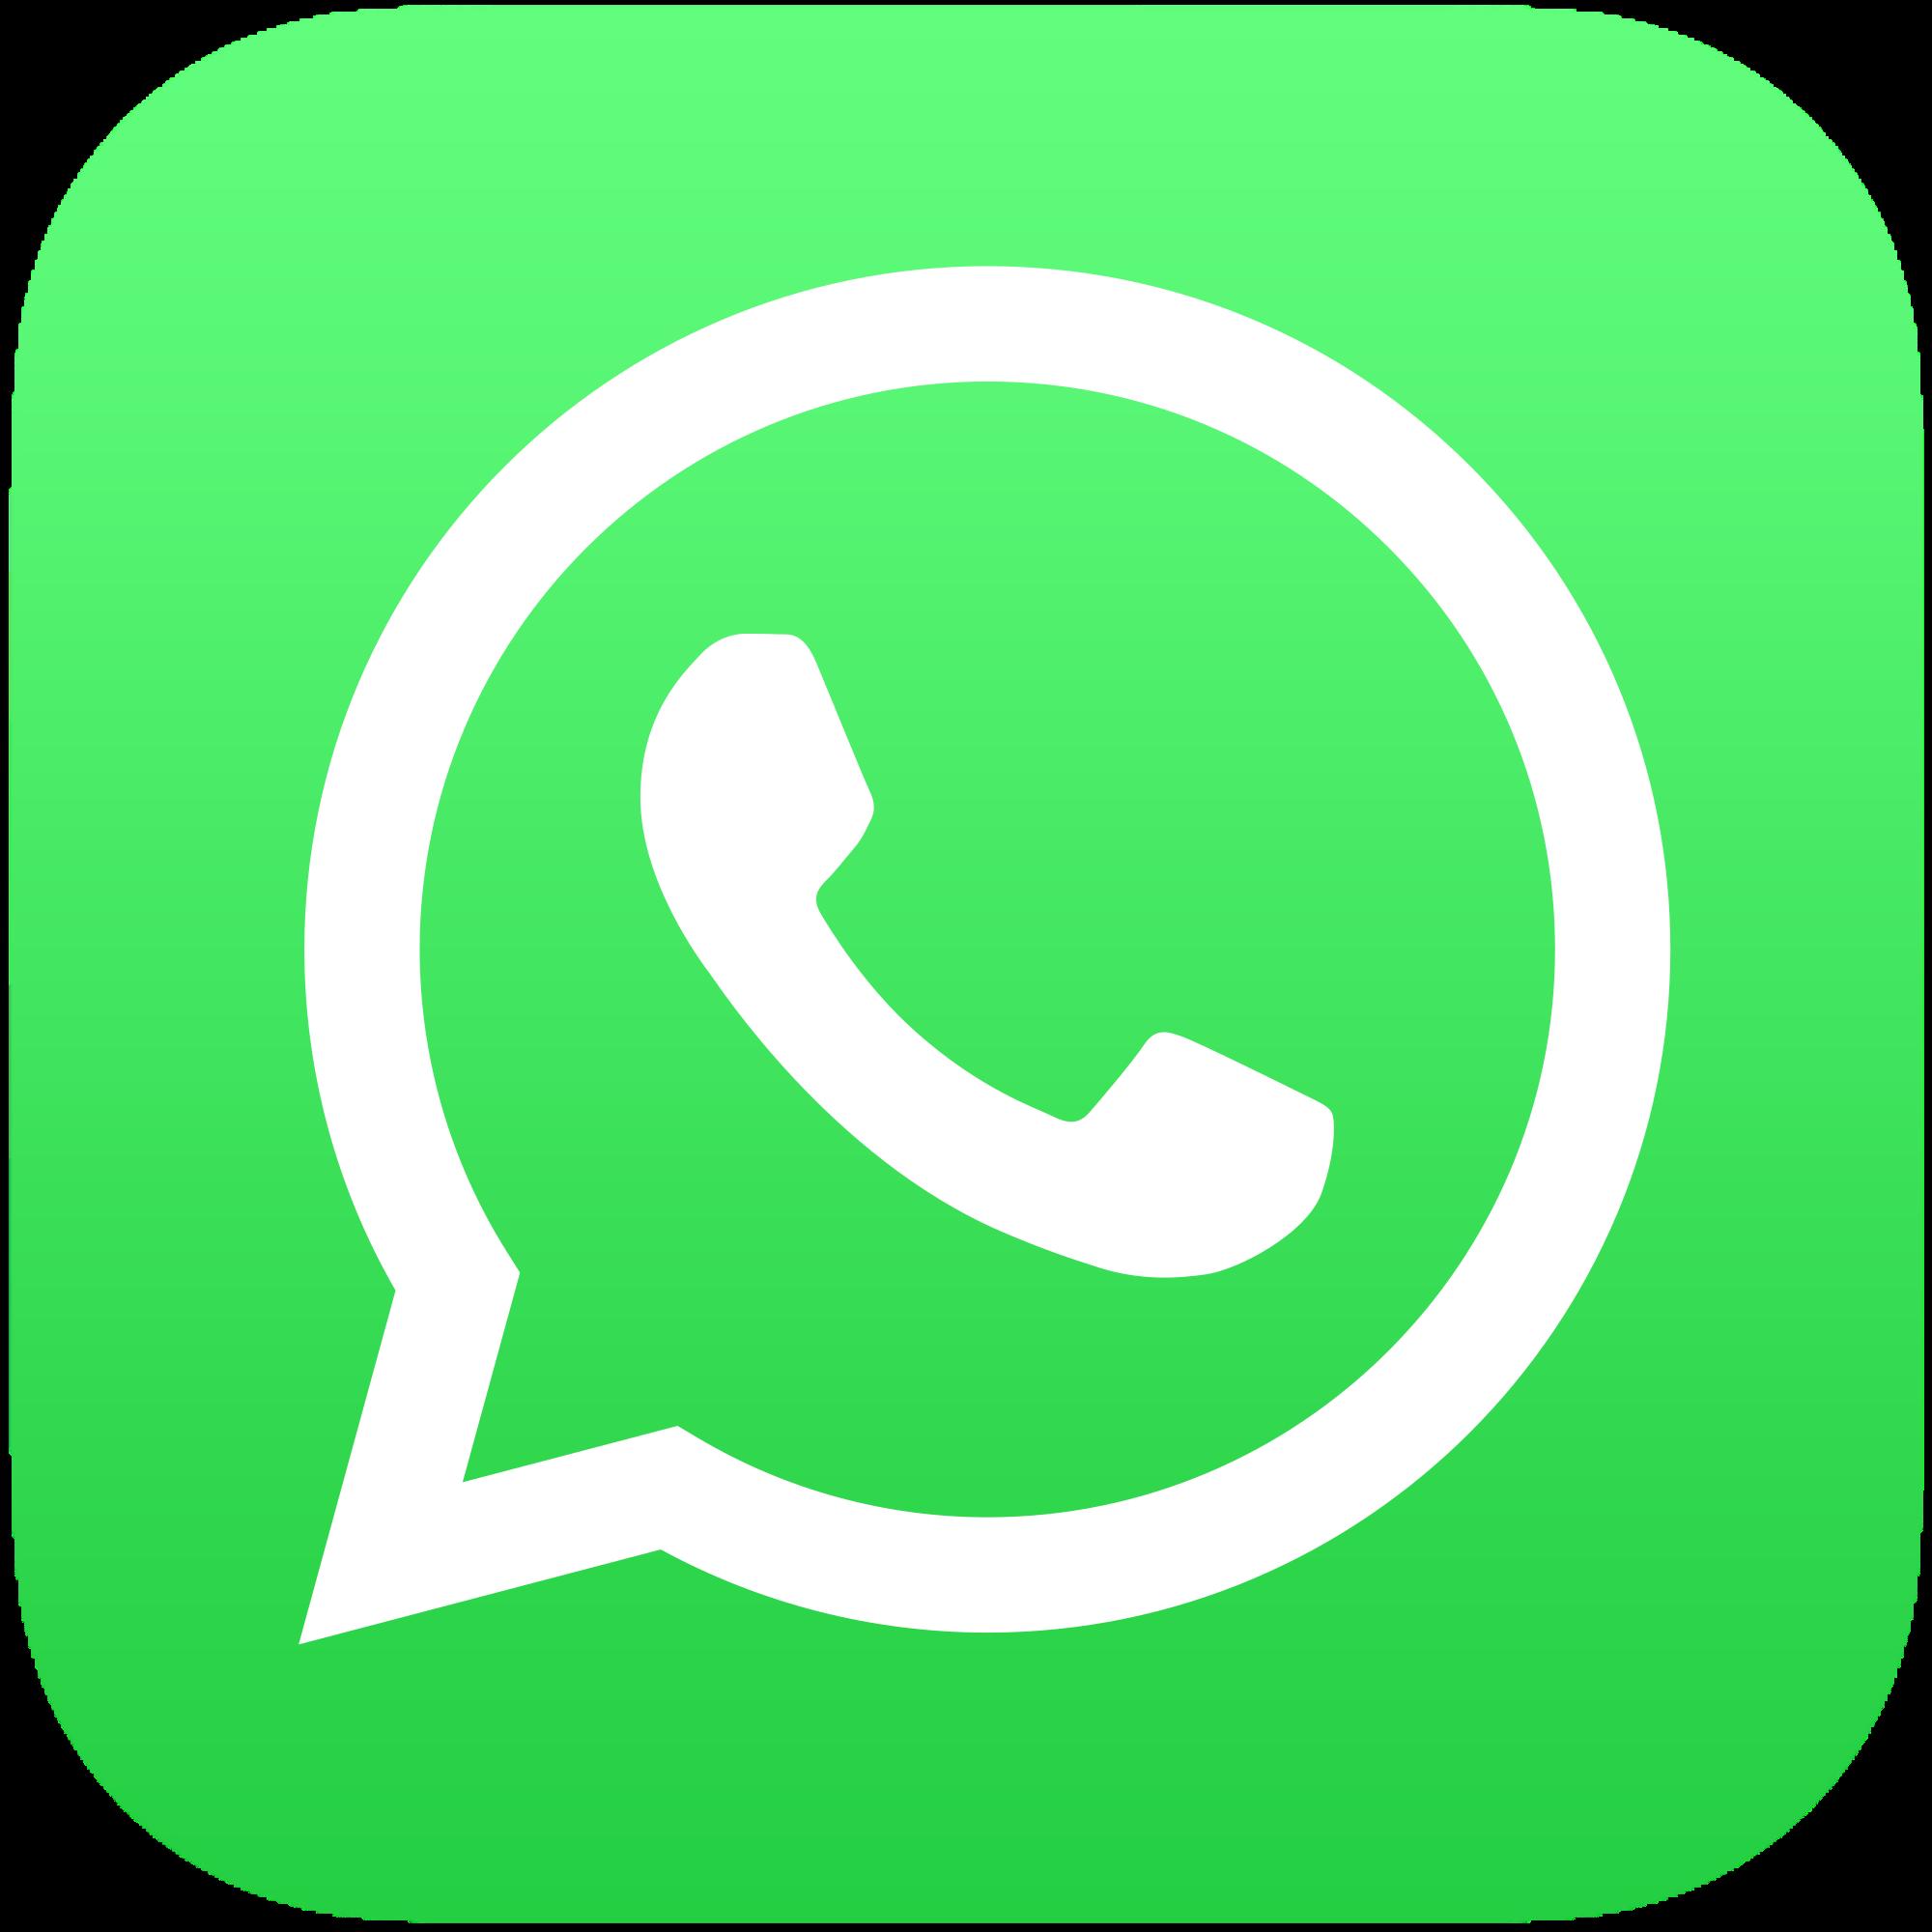 2000x2000 Whatsapp Whatsapp Logo Design Icons Vector Download